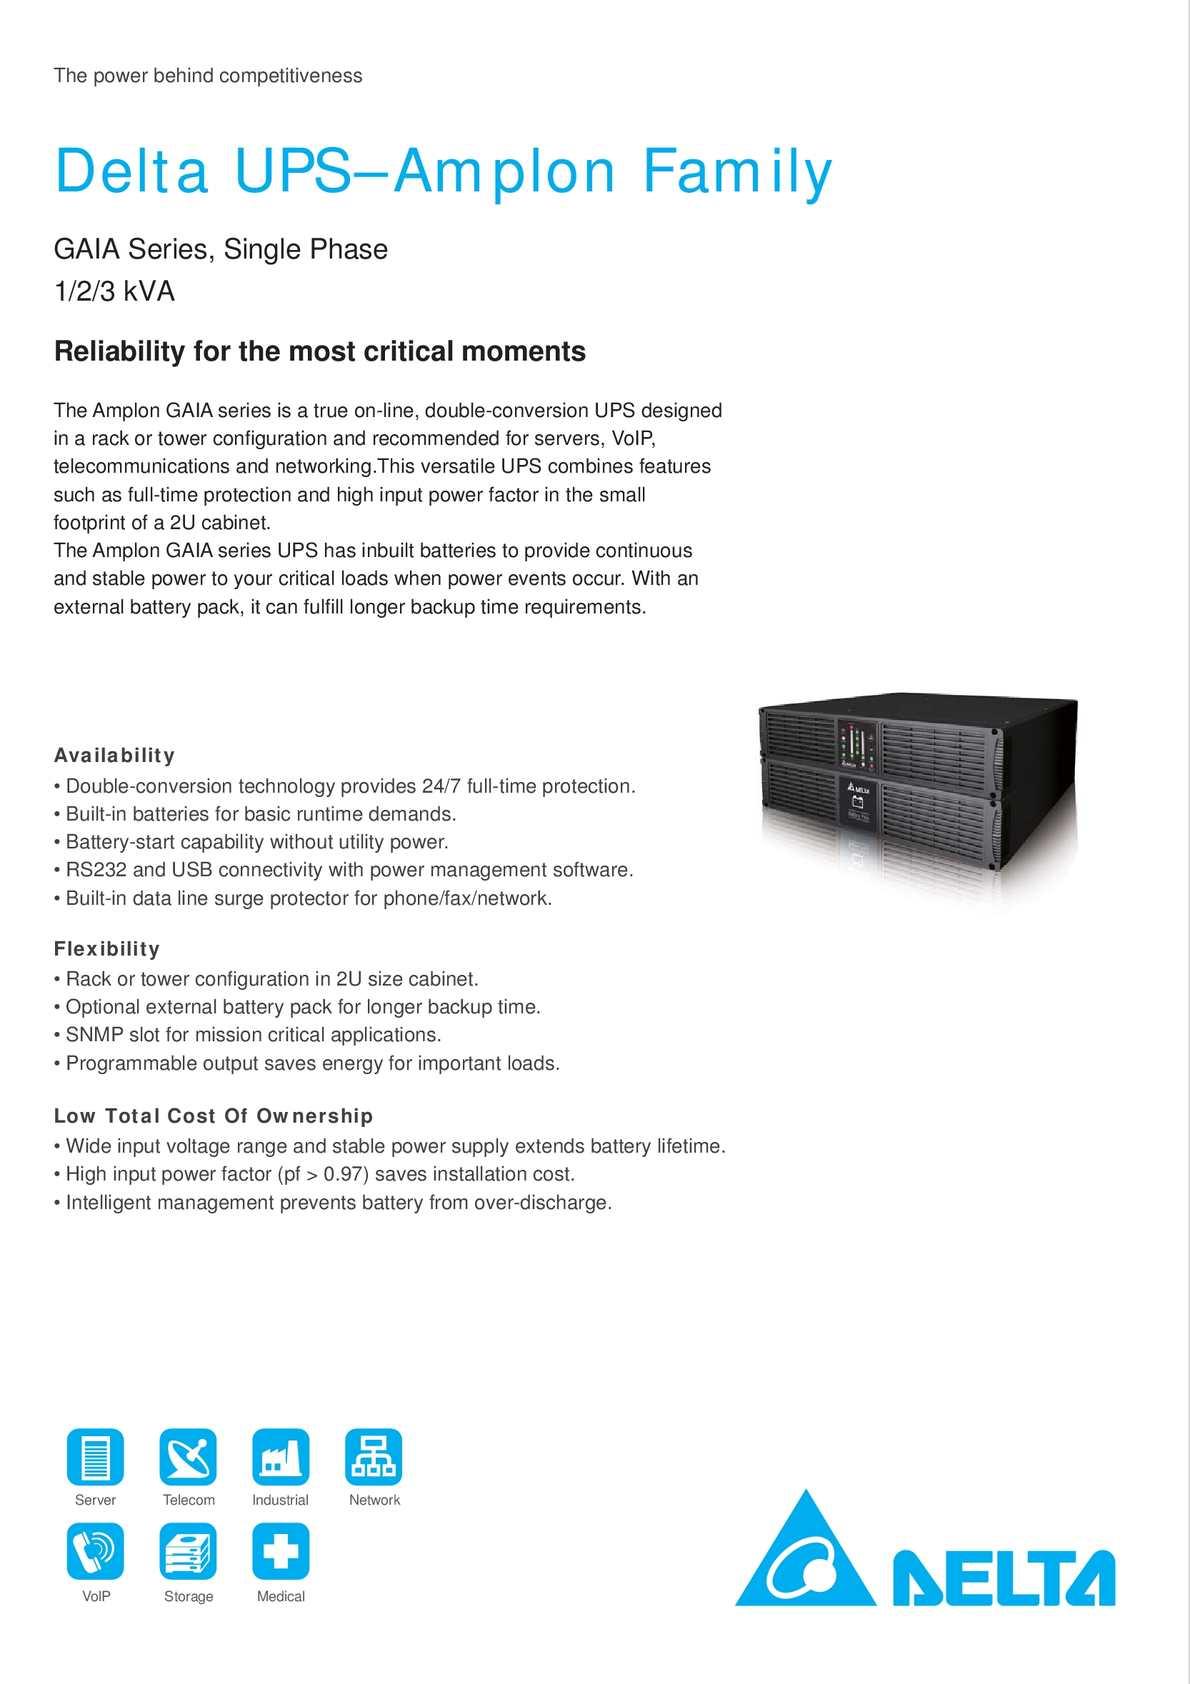 Calaméo - Deltapowersolutions com - Amplon GAIA Series 1-2-3